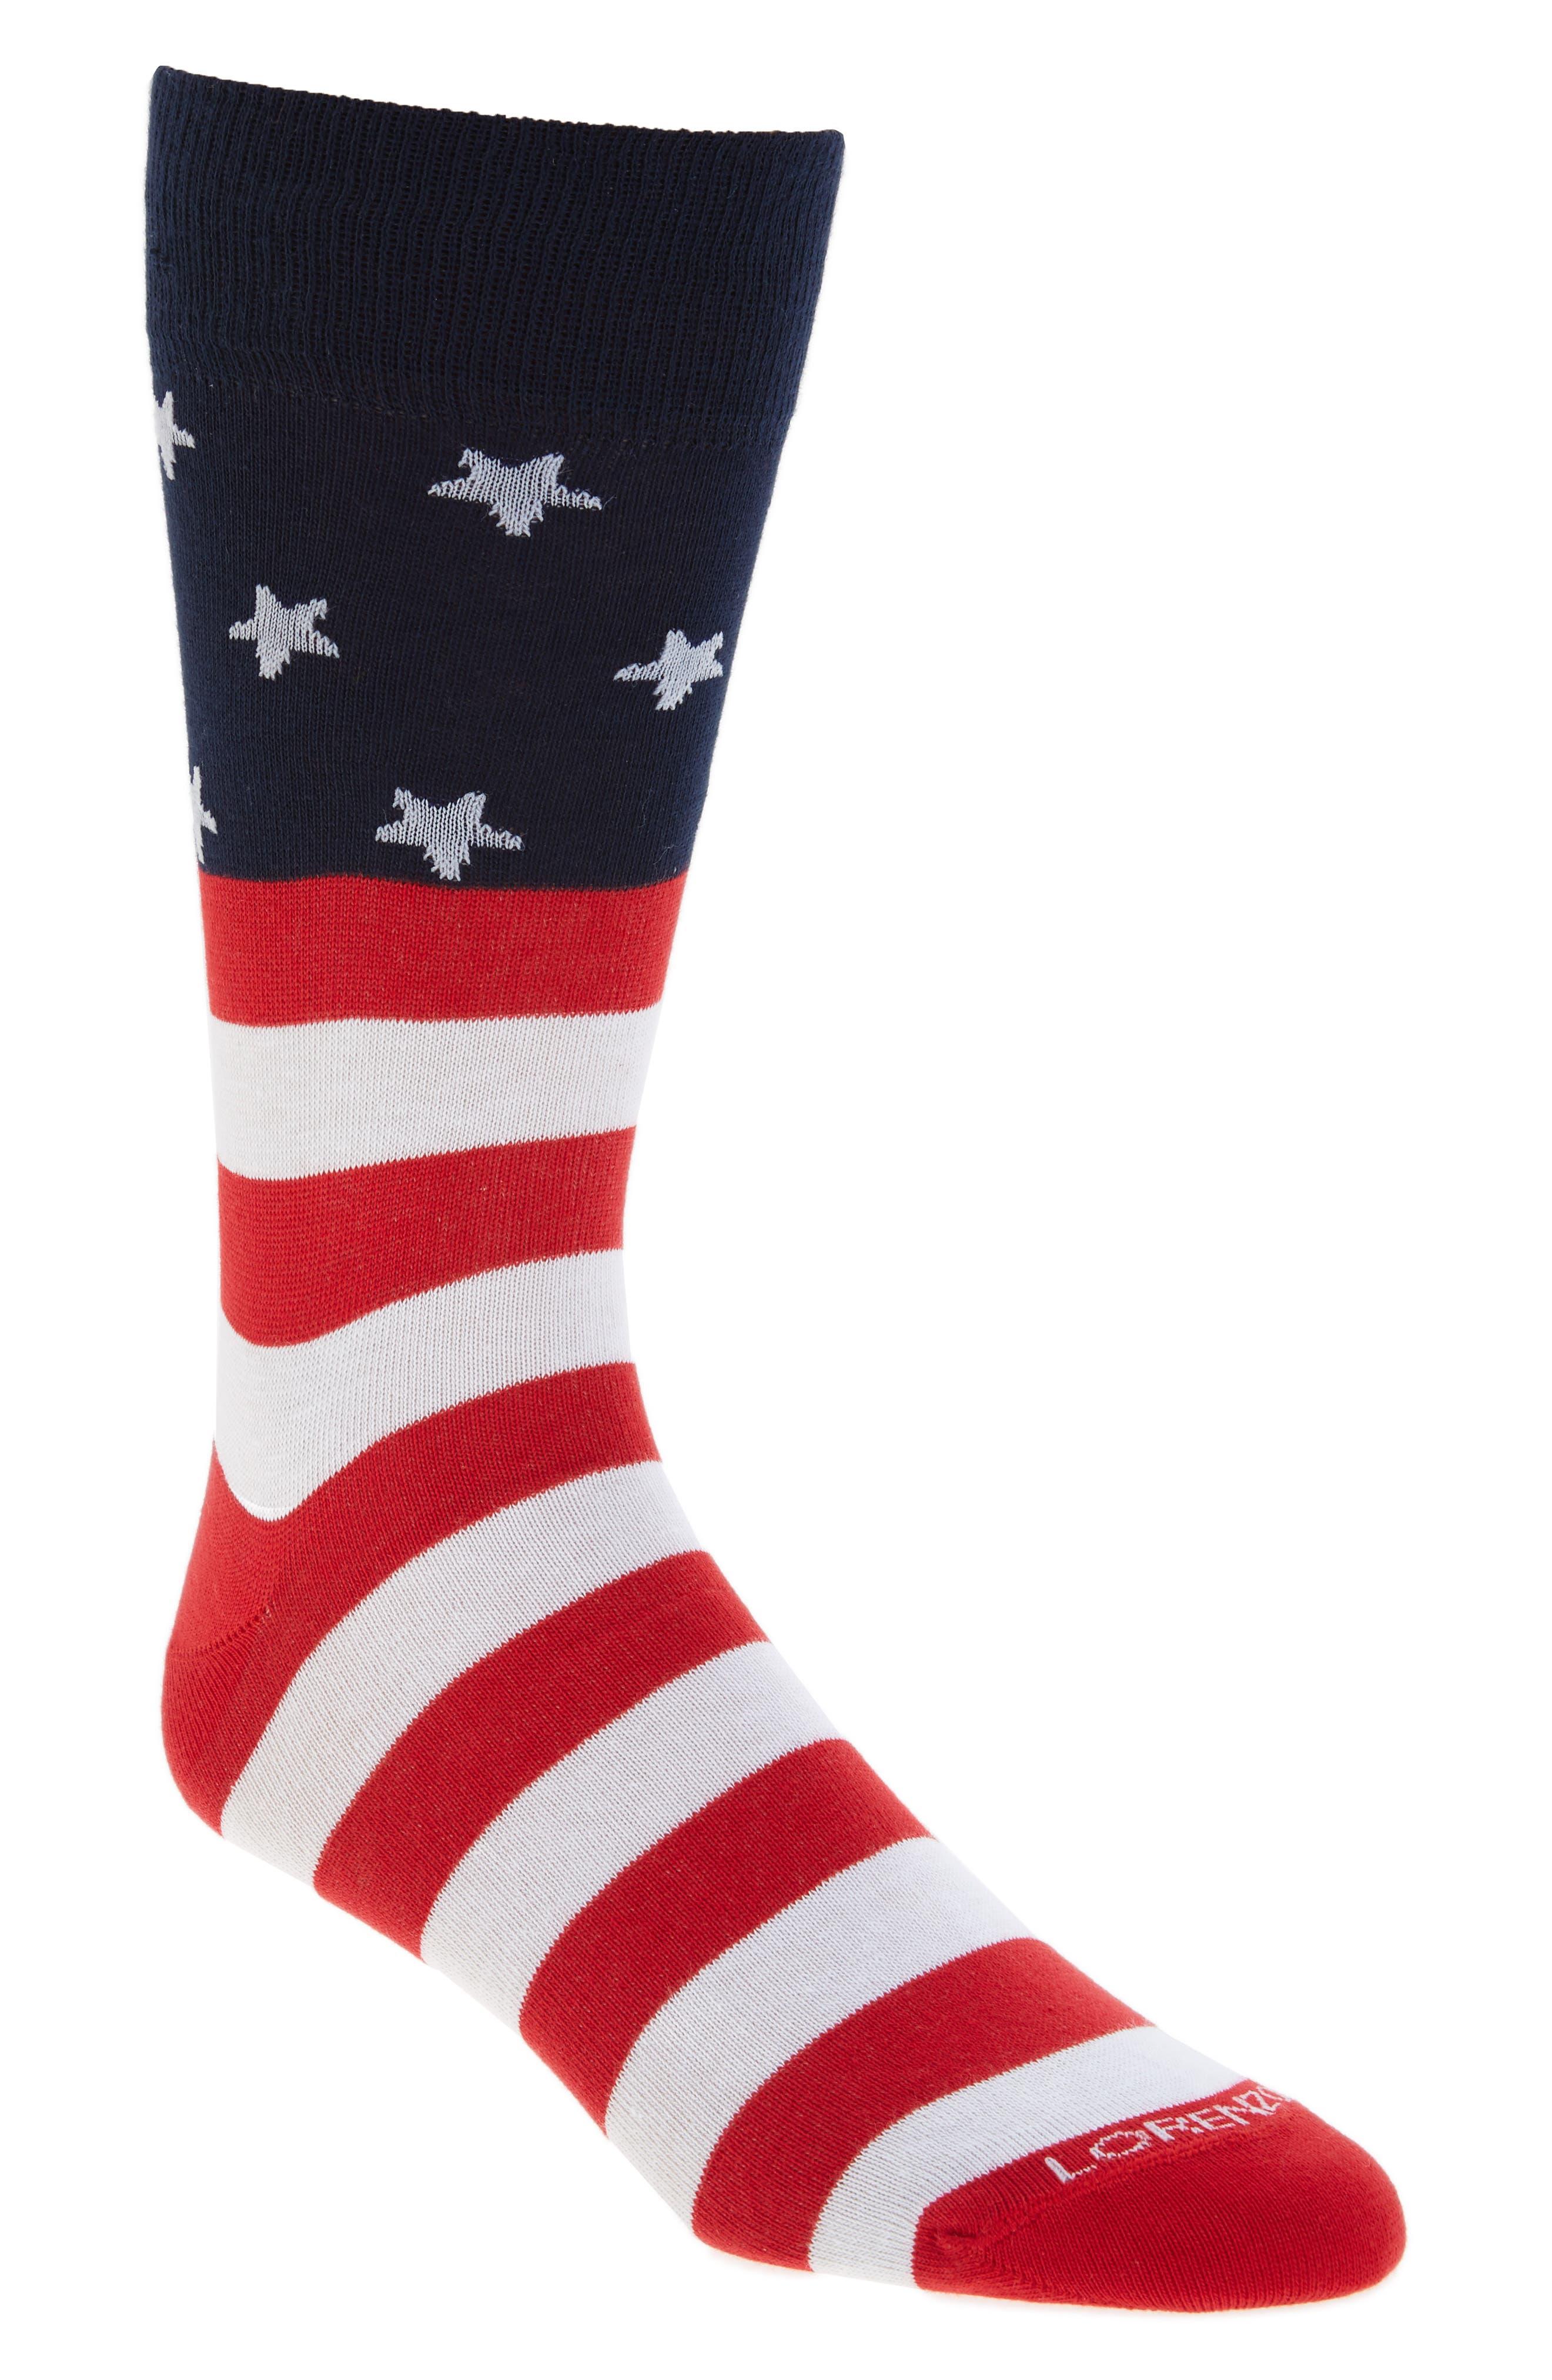 LORENZO UOMO Americana Crew Socks